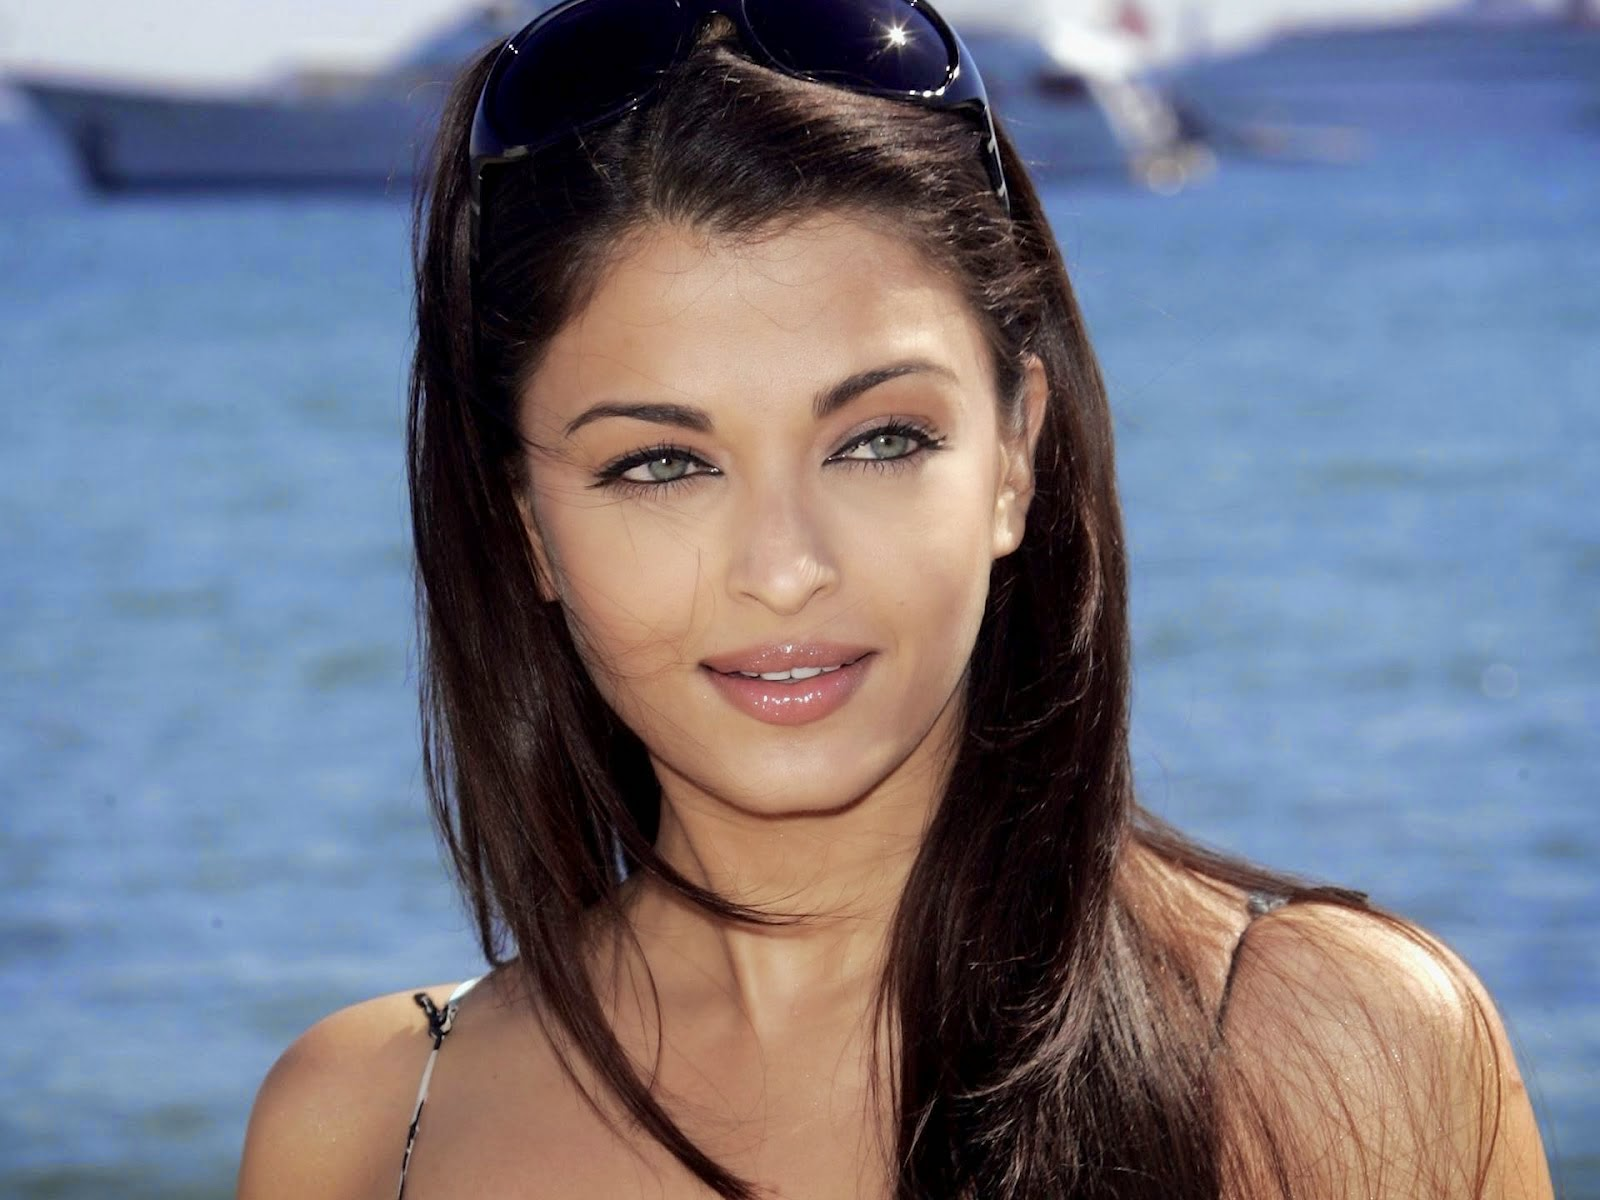 Самые красивые девушки на планете фото топ 10